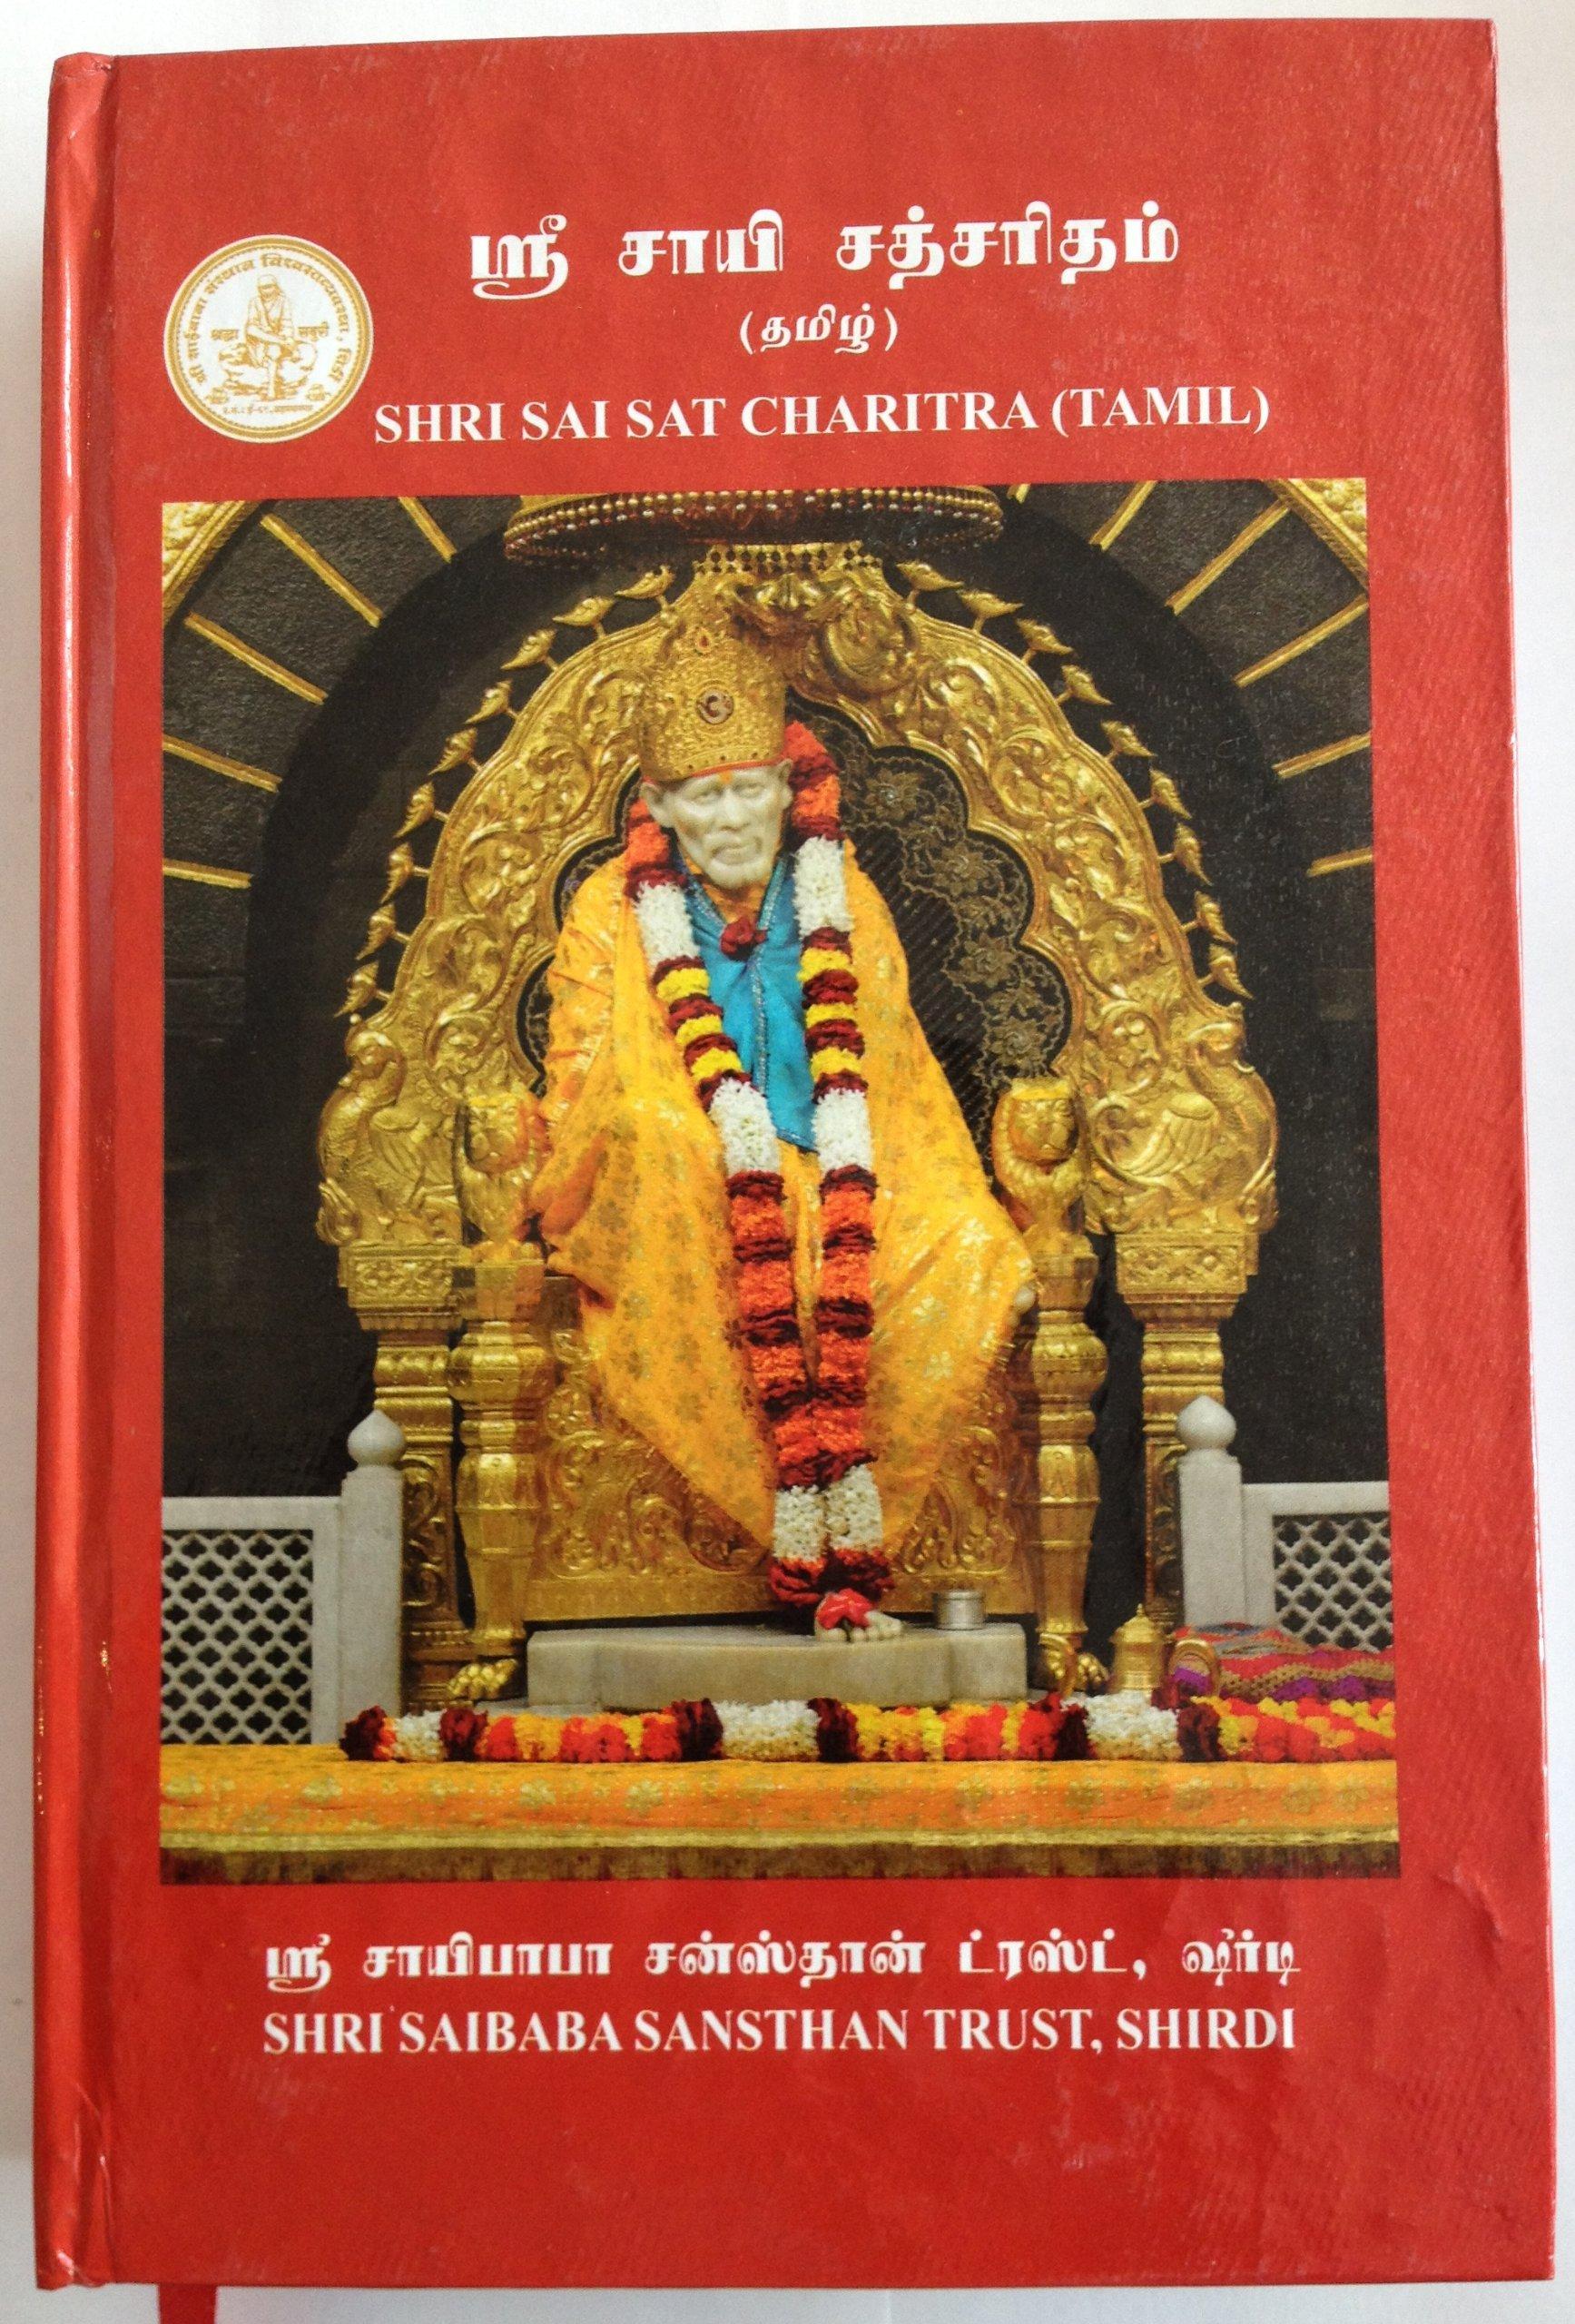 The wonderful life and teachings of Shri Sai Baba, adapted